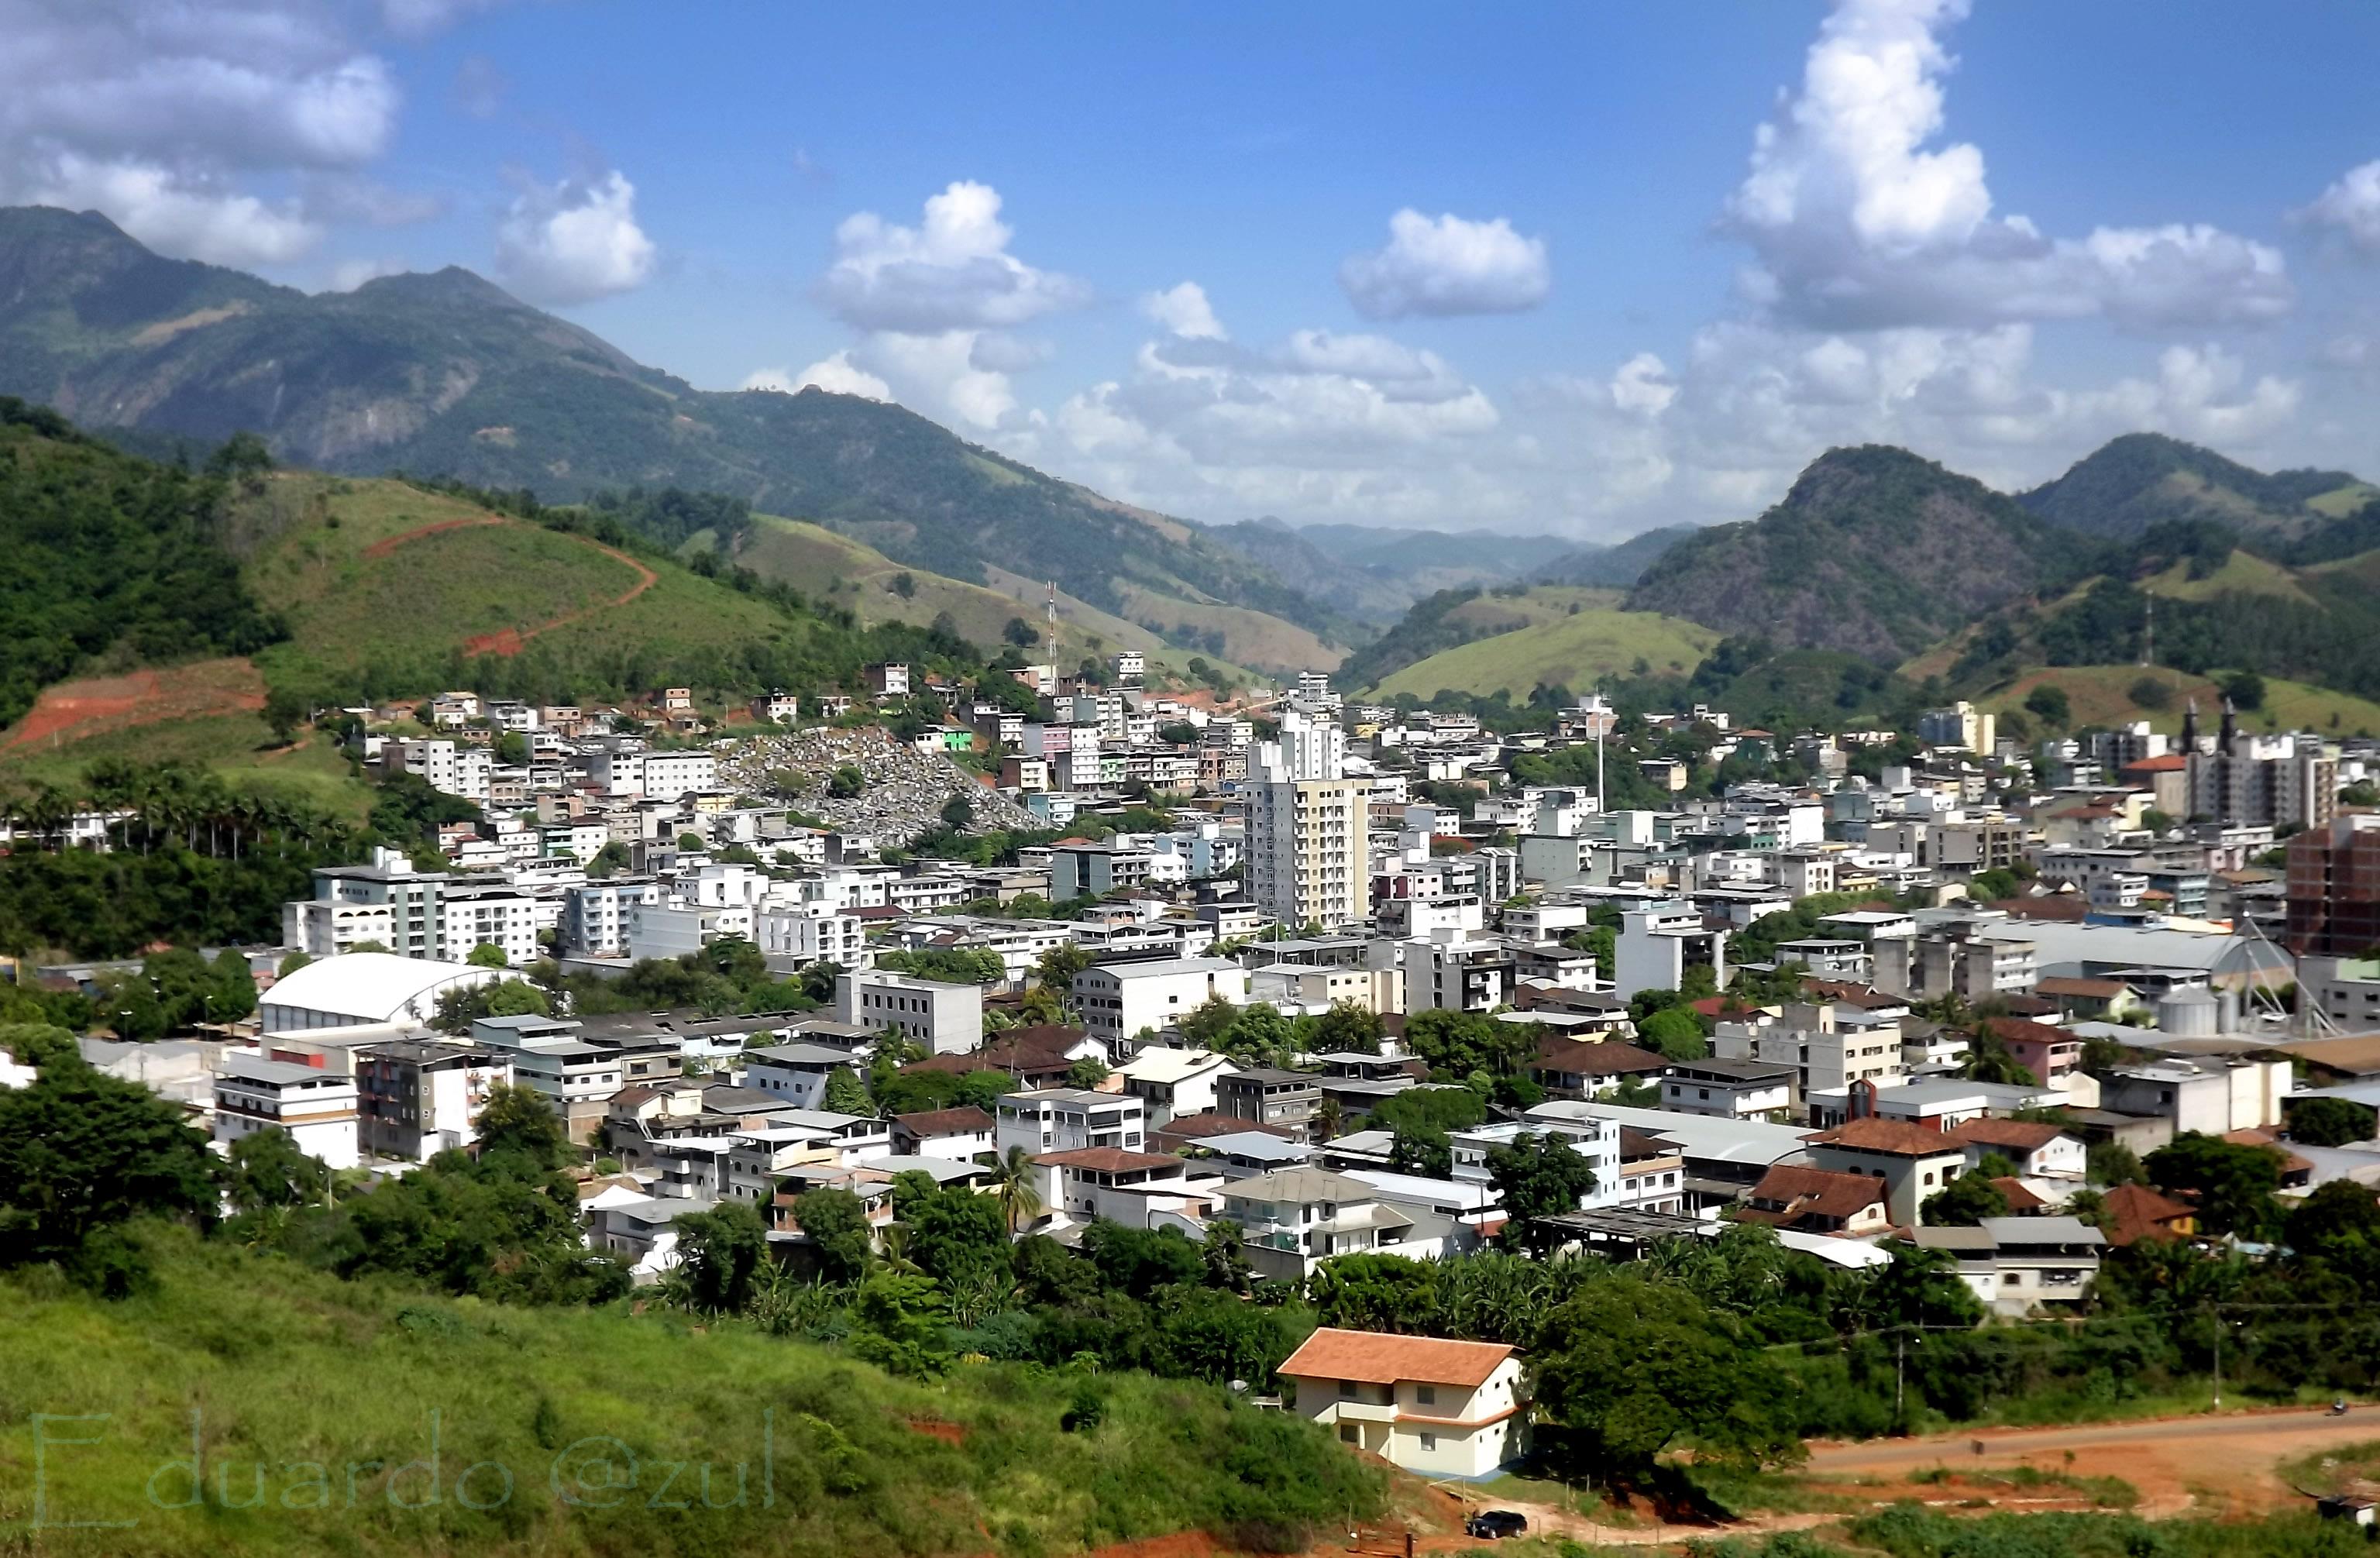 Castelo Espírito Santo fonte: upload.wikimedia.org